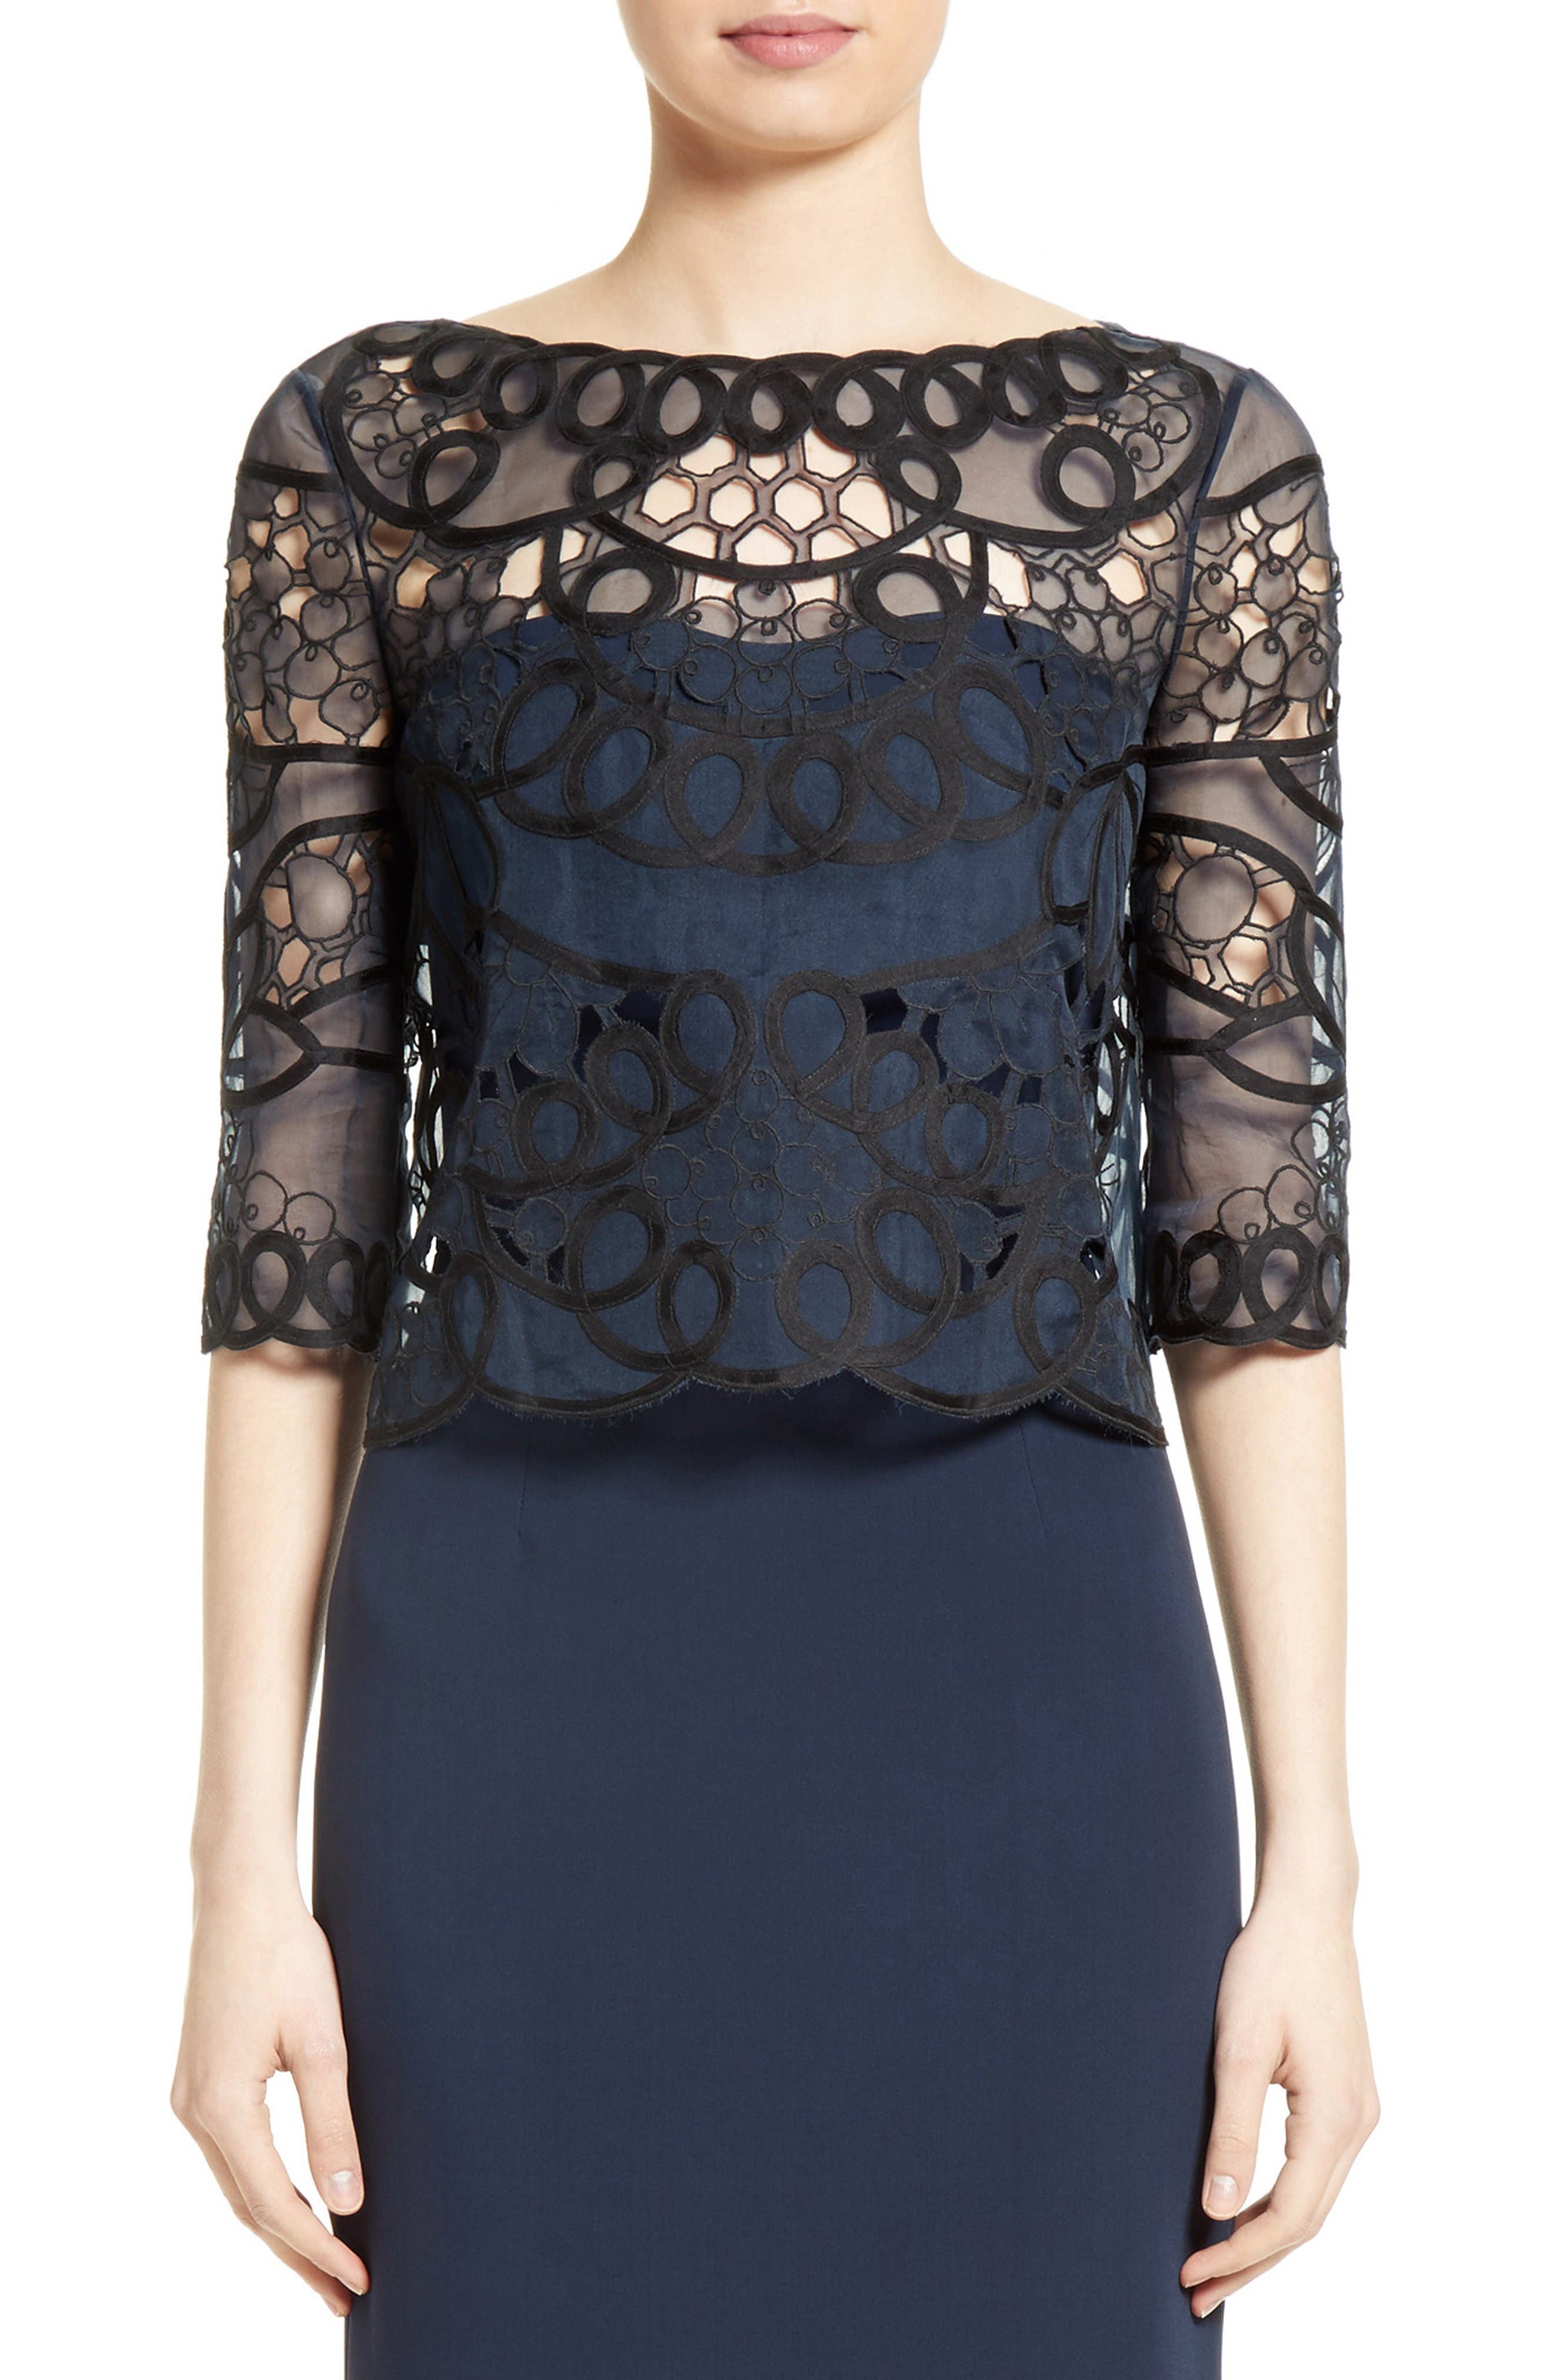 Reversible Lace Bolero,                         Main,                         color, Navy/ Black